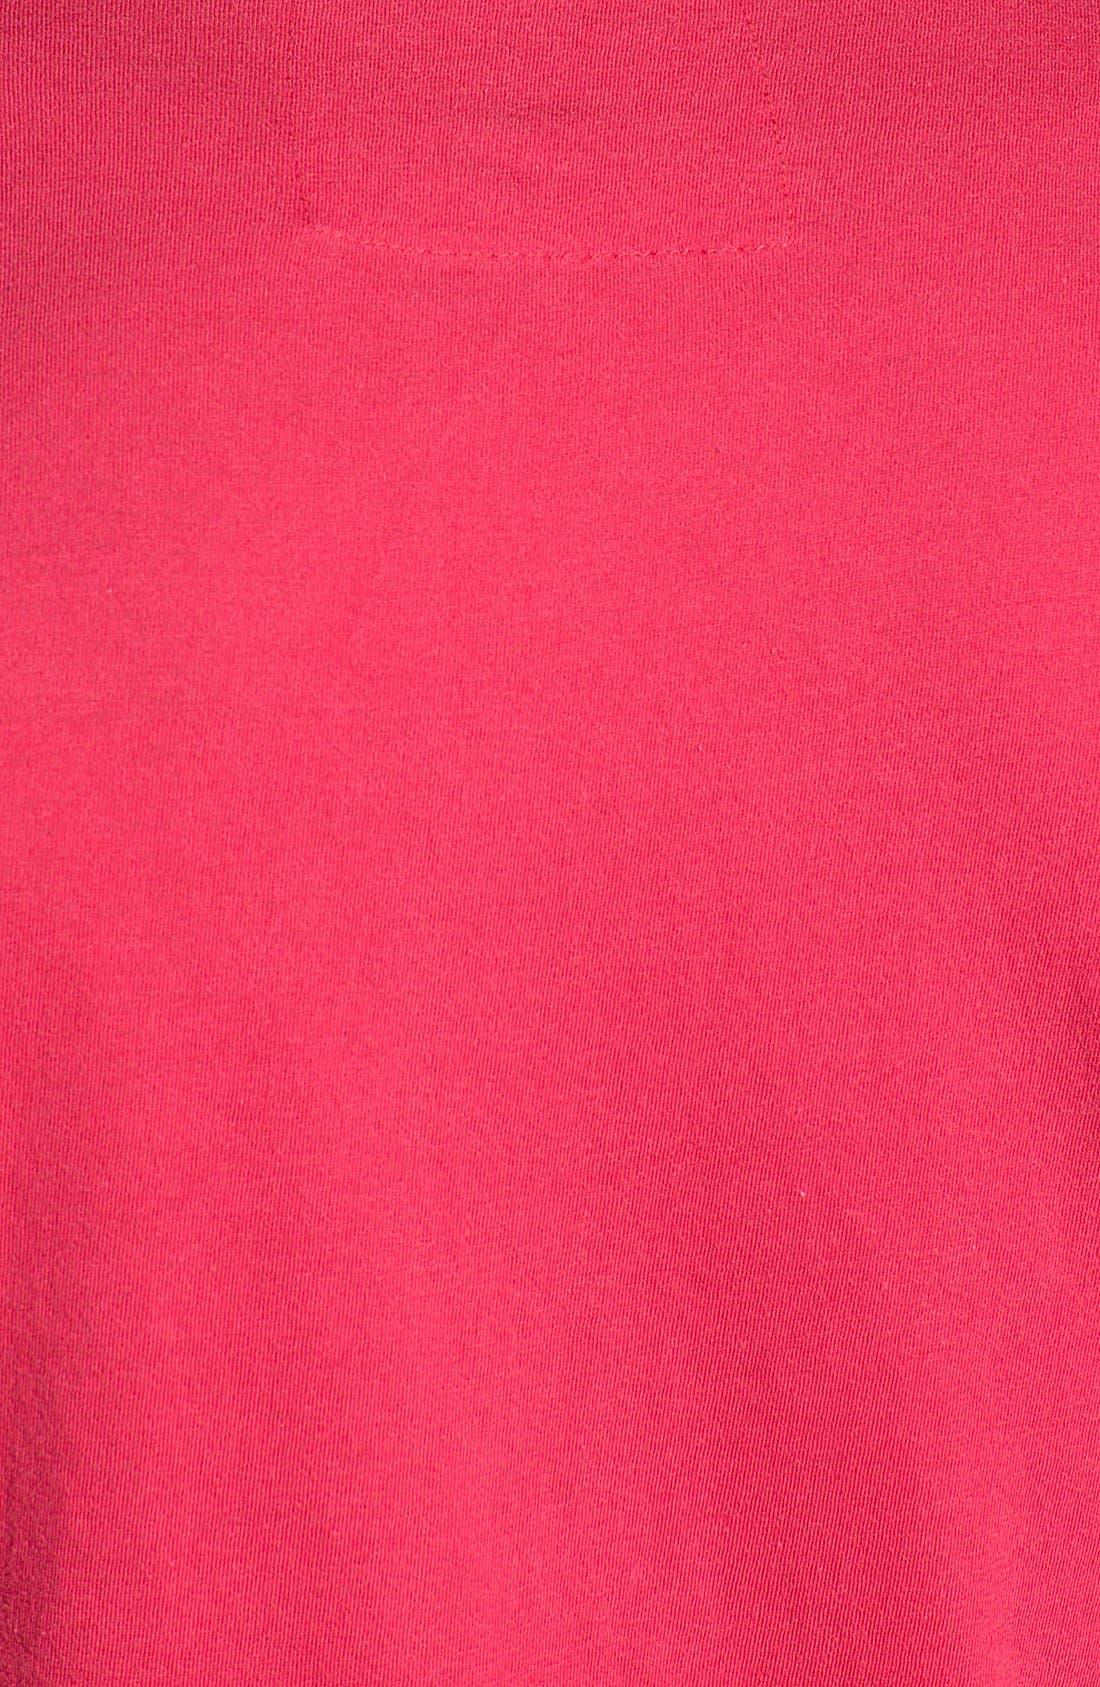 Alternate Image 3  - Red Jacket 'Hurricanes - Brass Tack' T-Shirt